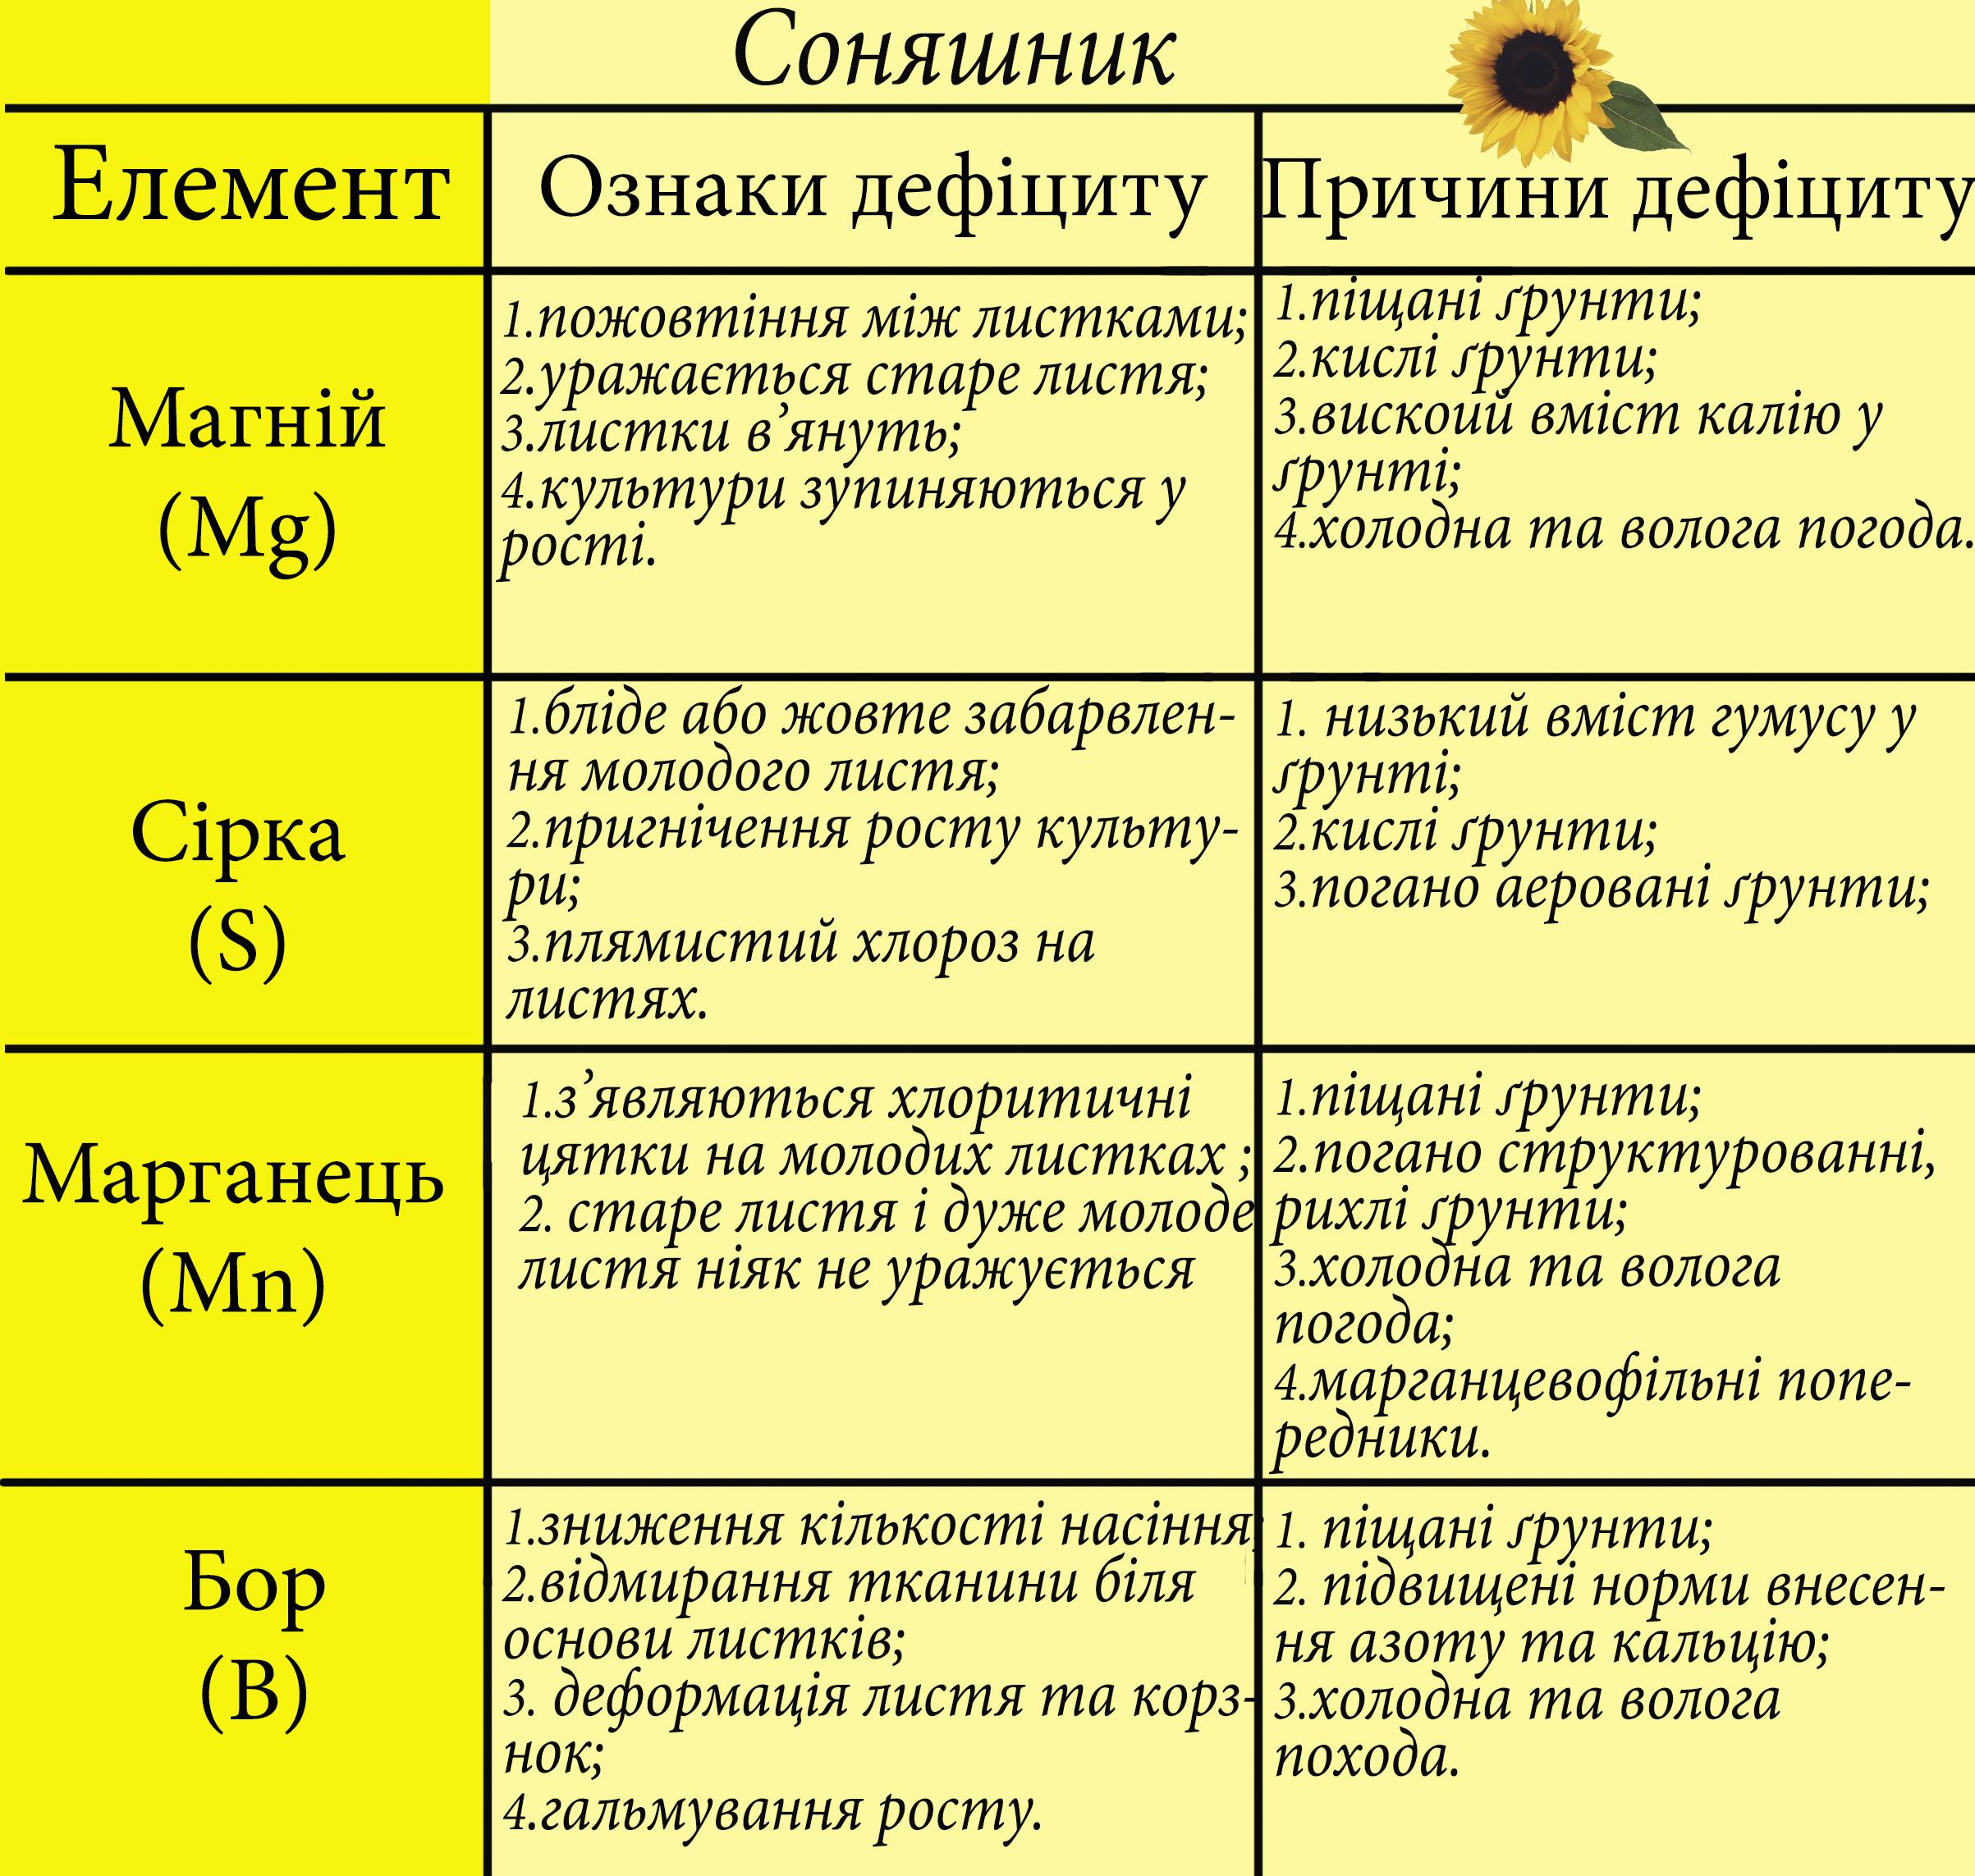 елементи на культурах - соняшник